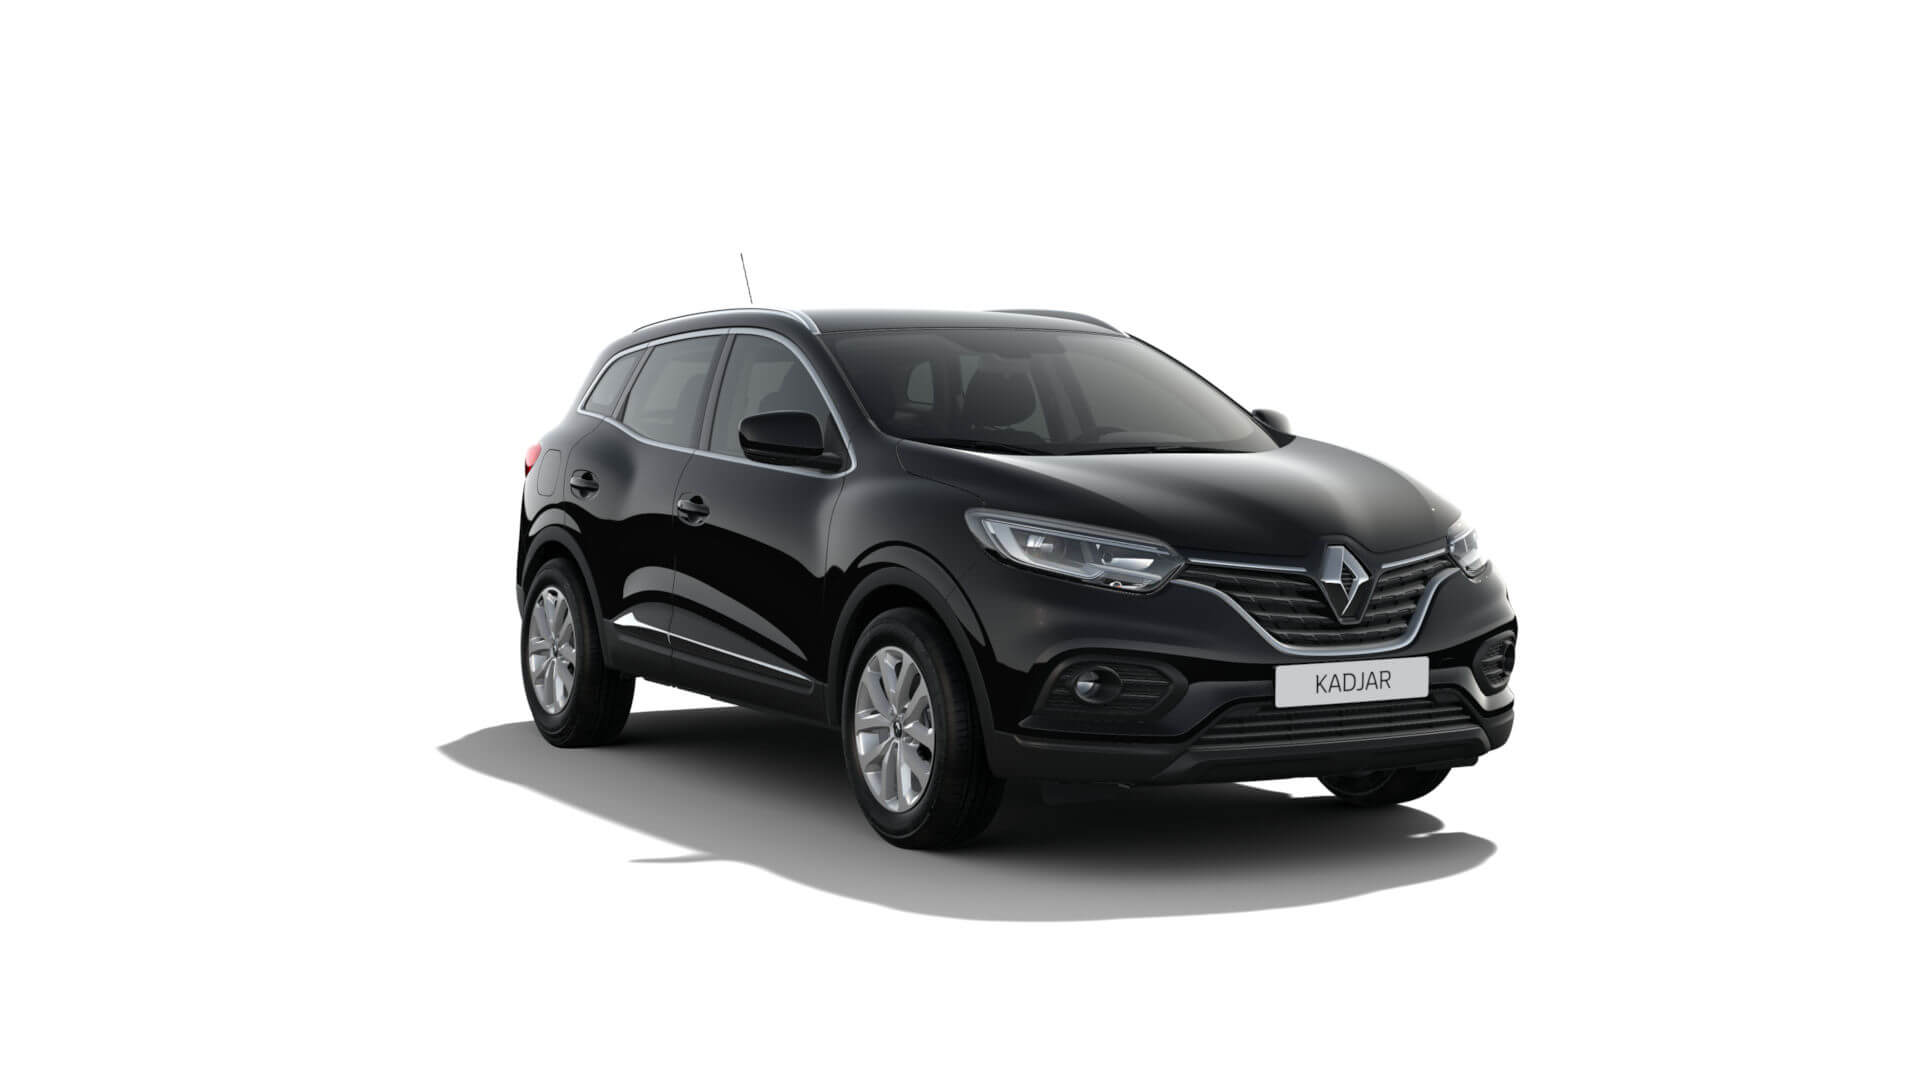 Automodell schwarz - Renault Kadjar - Renault Ahrens Hannover